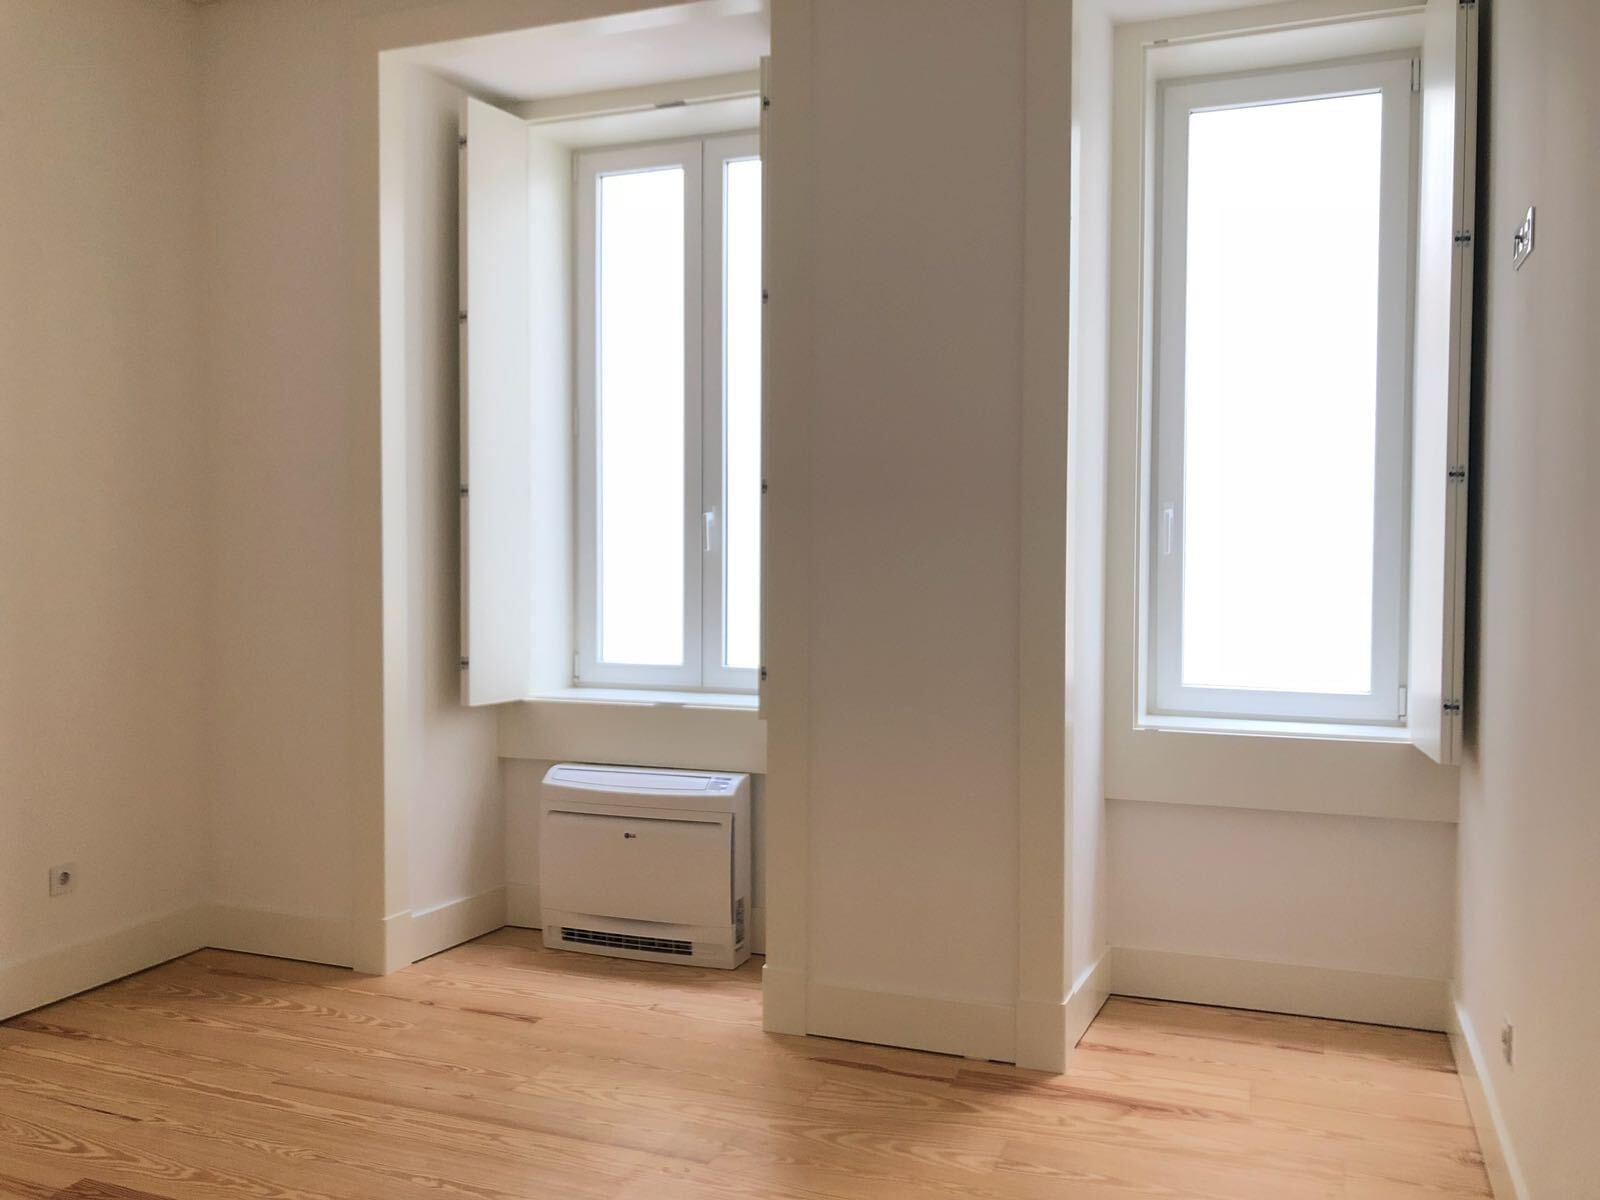 pf17142-apartamento-t2-lisboa-aae28486-83dc-4fbe-8d99-48bfc619bf48